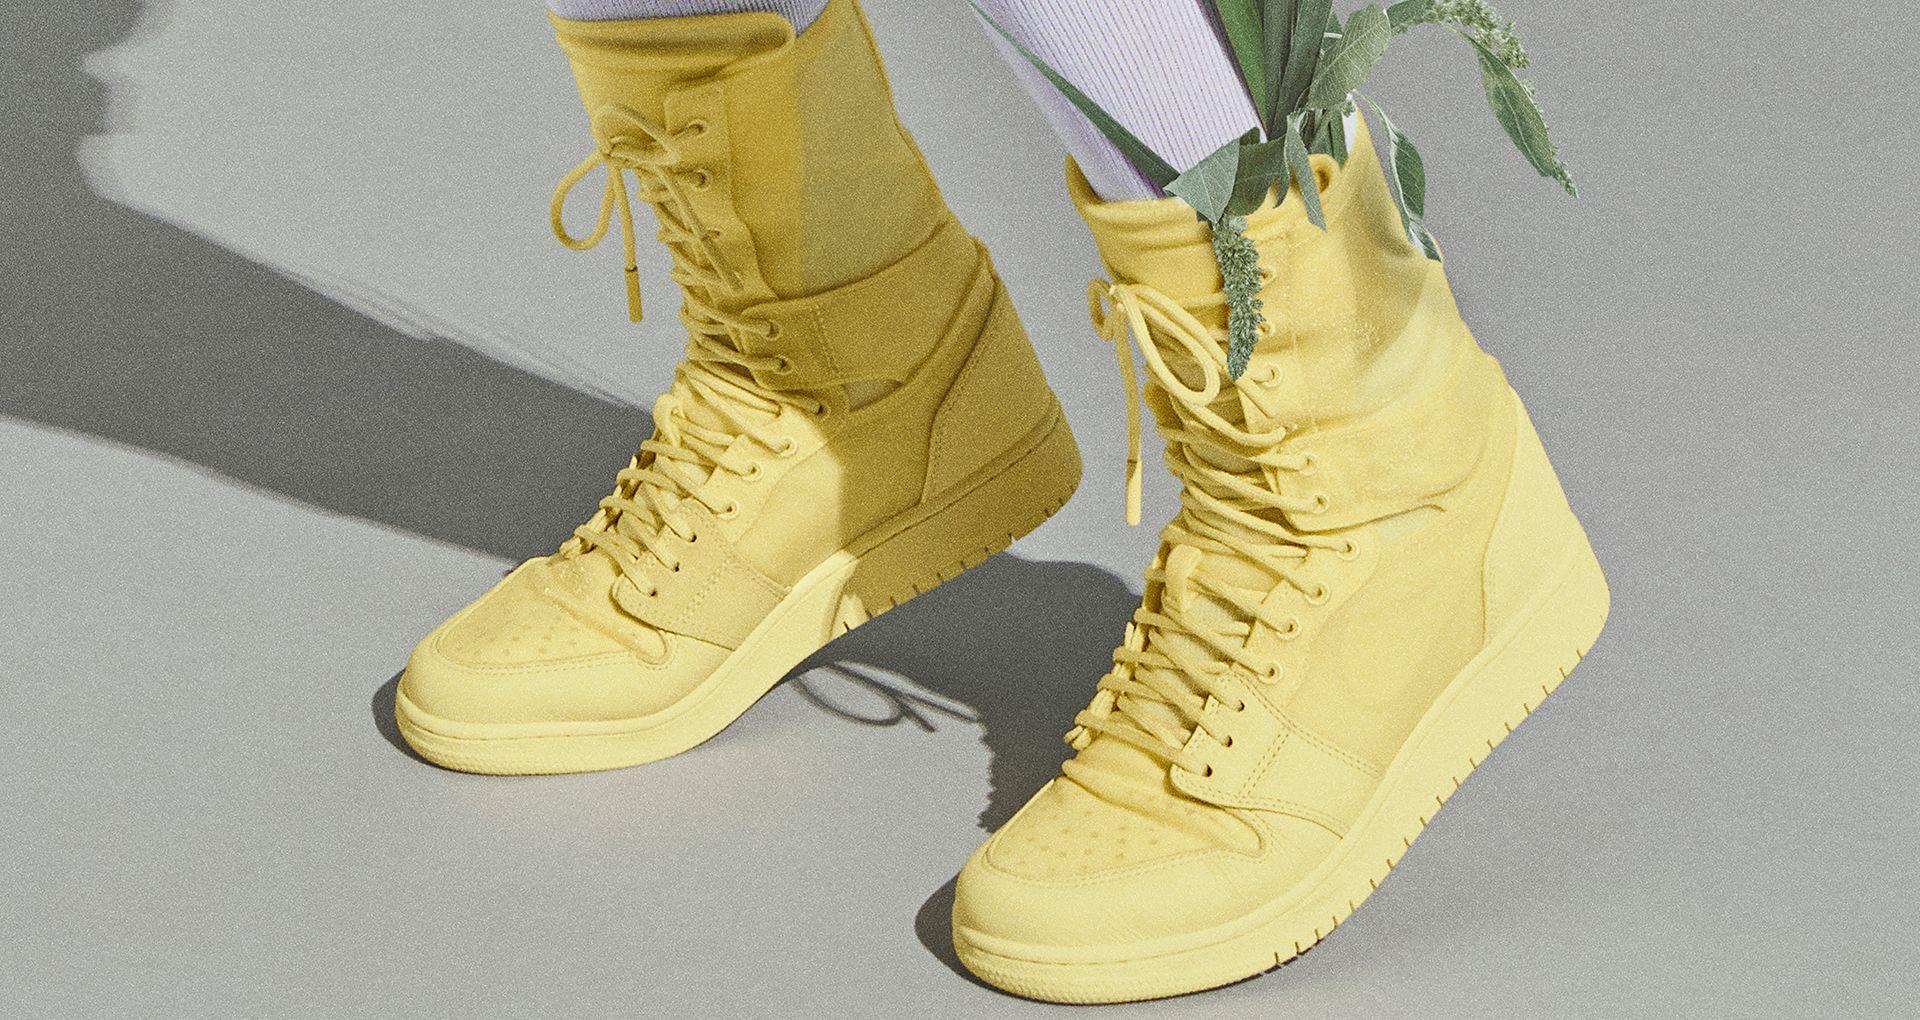 acb06fae8f9b99 Women's Air Jordan 1 Explorer XX 'Luminous Green' Release Date. Nike ...